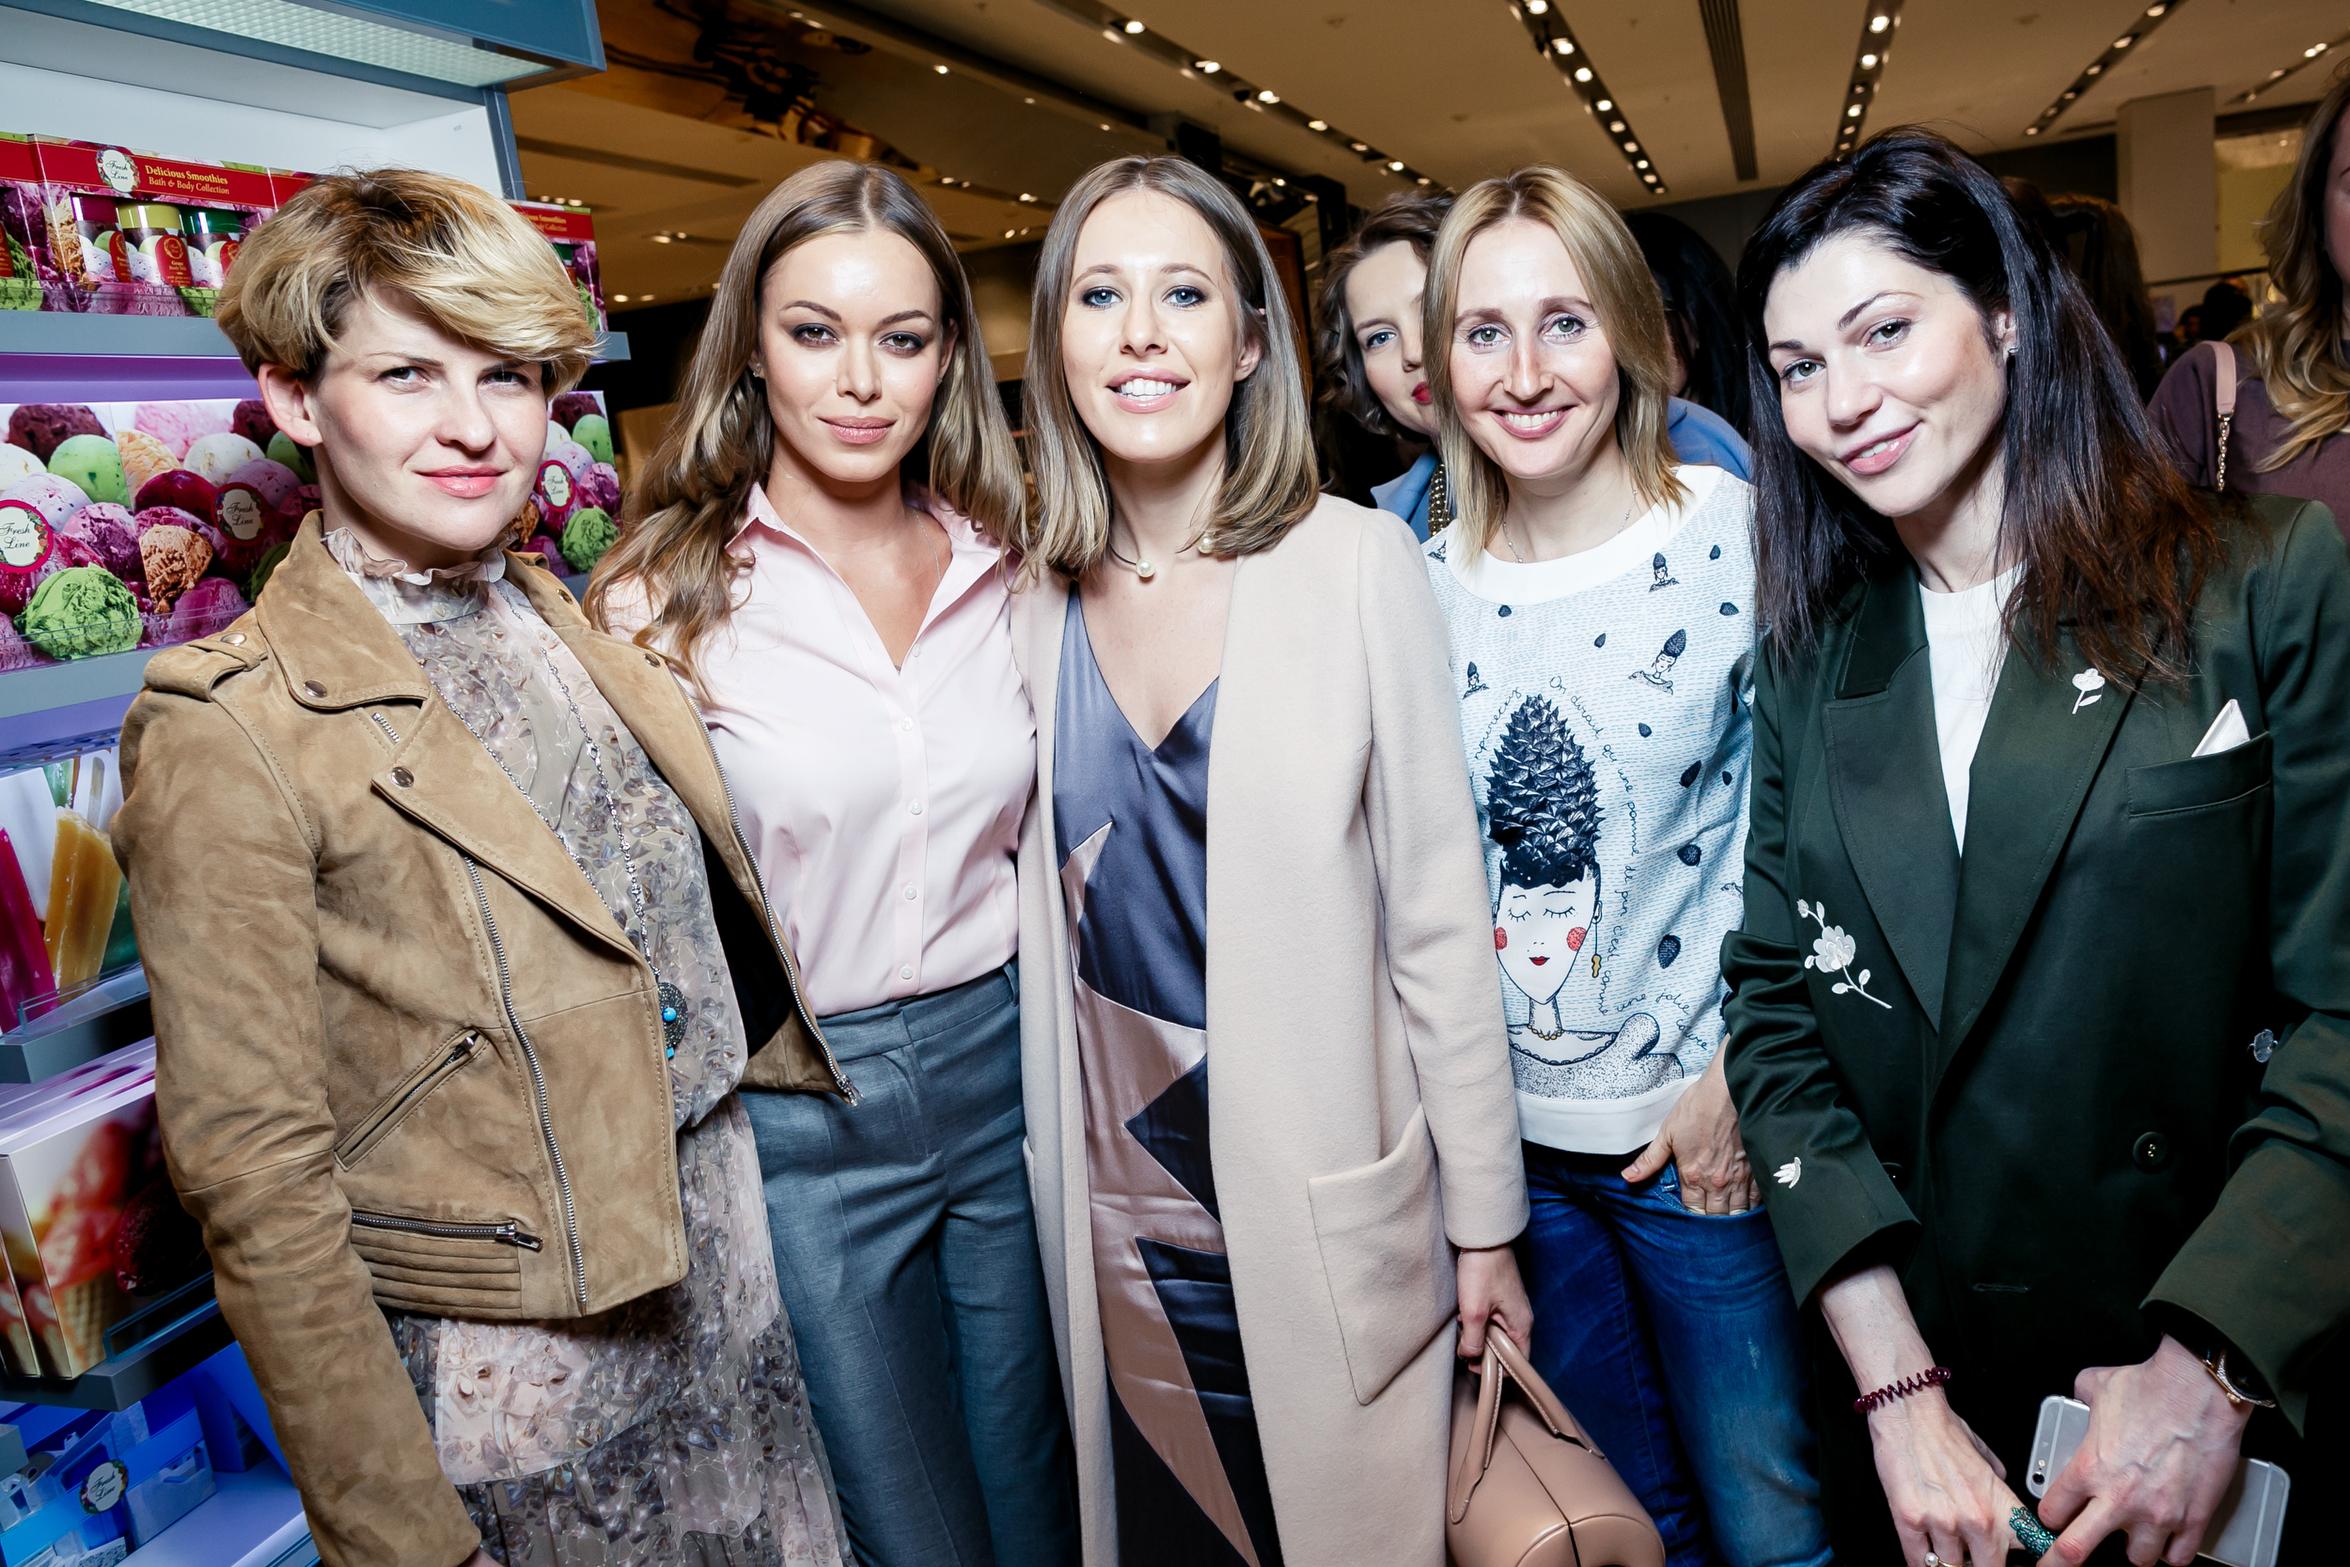 Полина Киценко, Анастасия Романцова, Ксения Собчак, Оксана Бондаренко, Евгения Линович